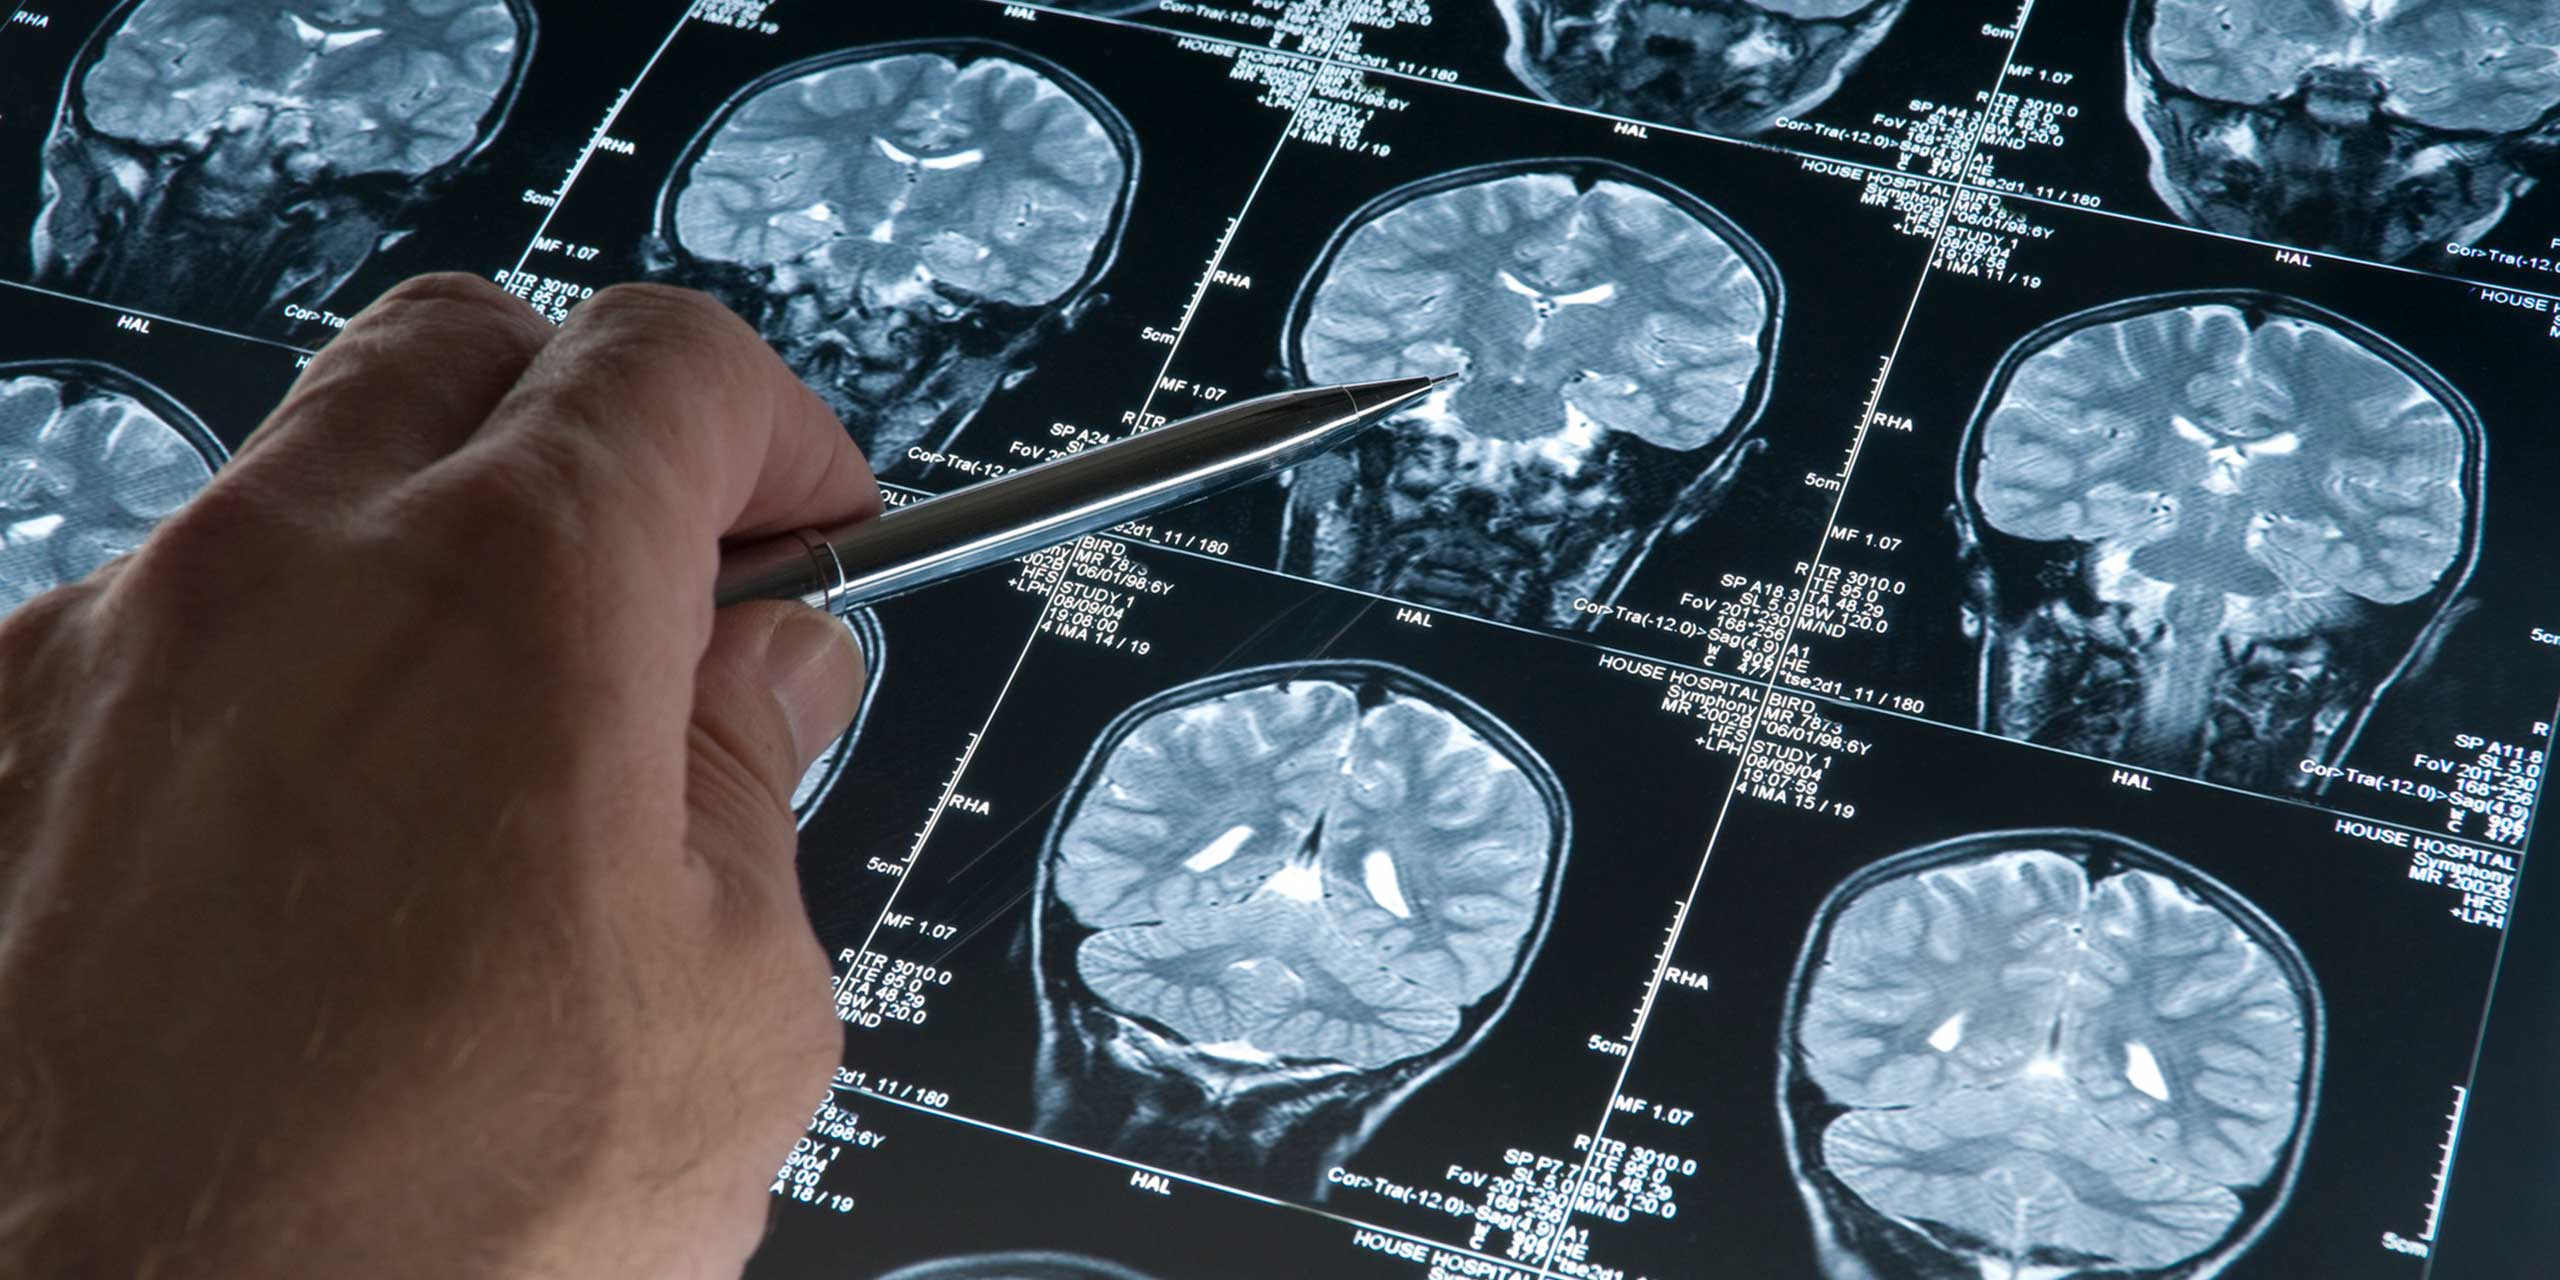 MS Progression Linked to Grey Matter Atrophy